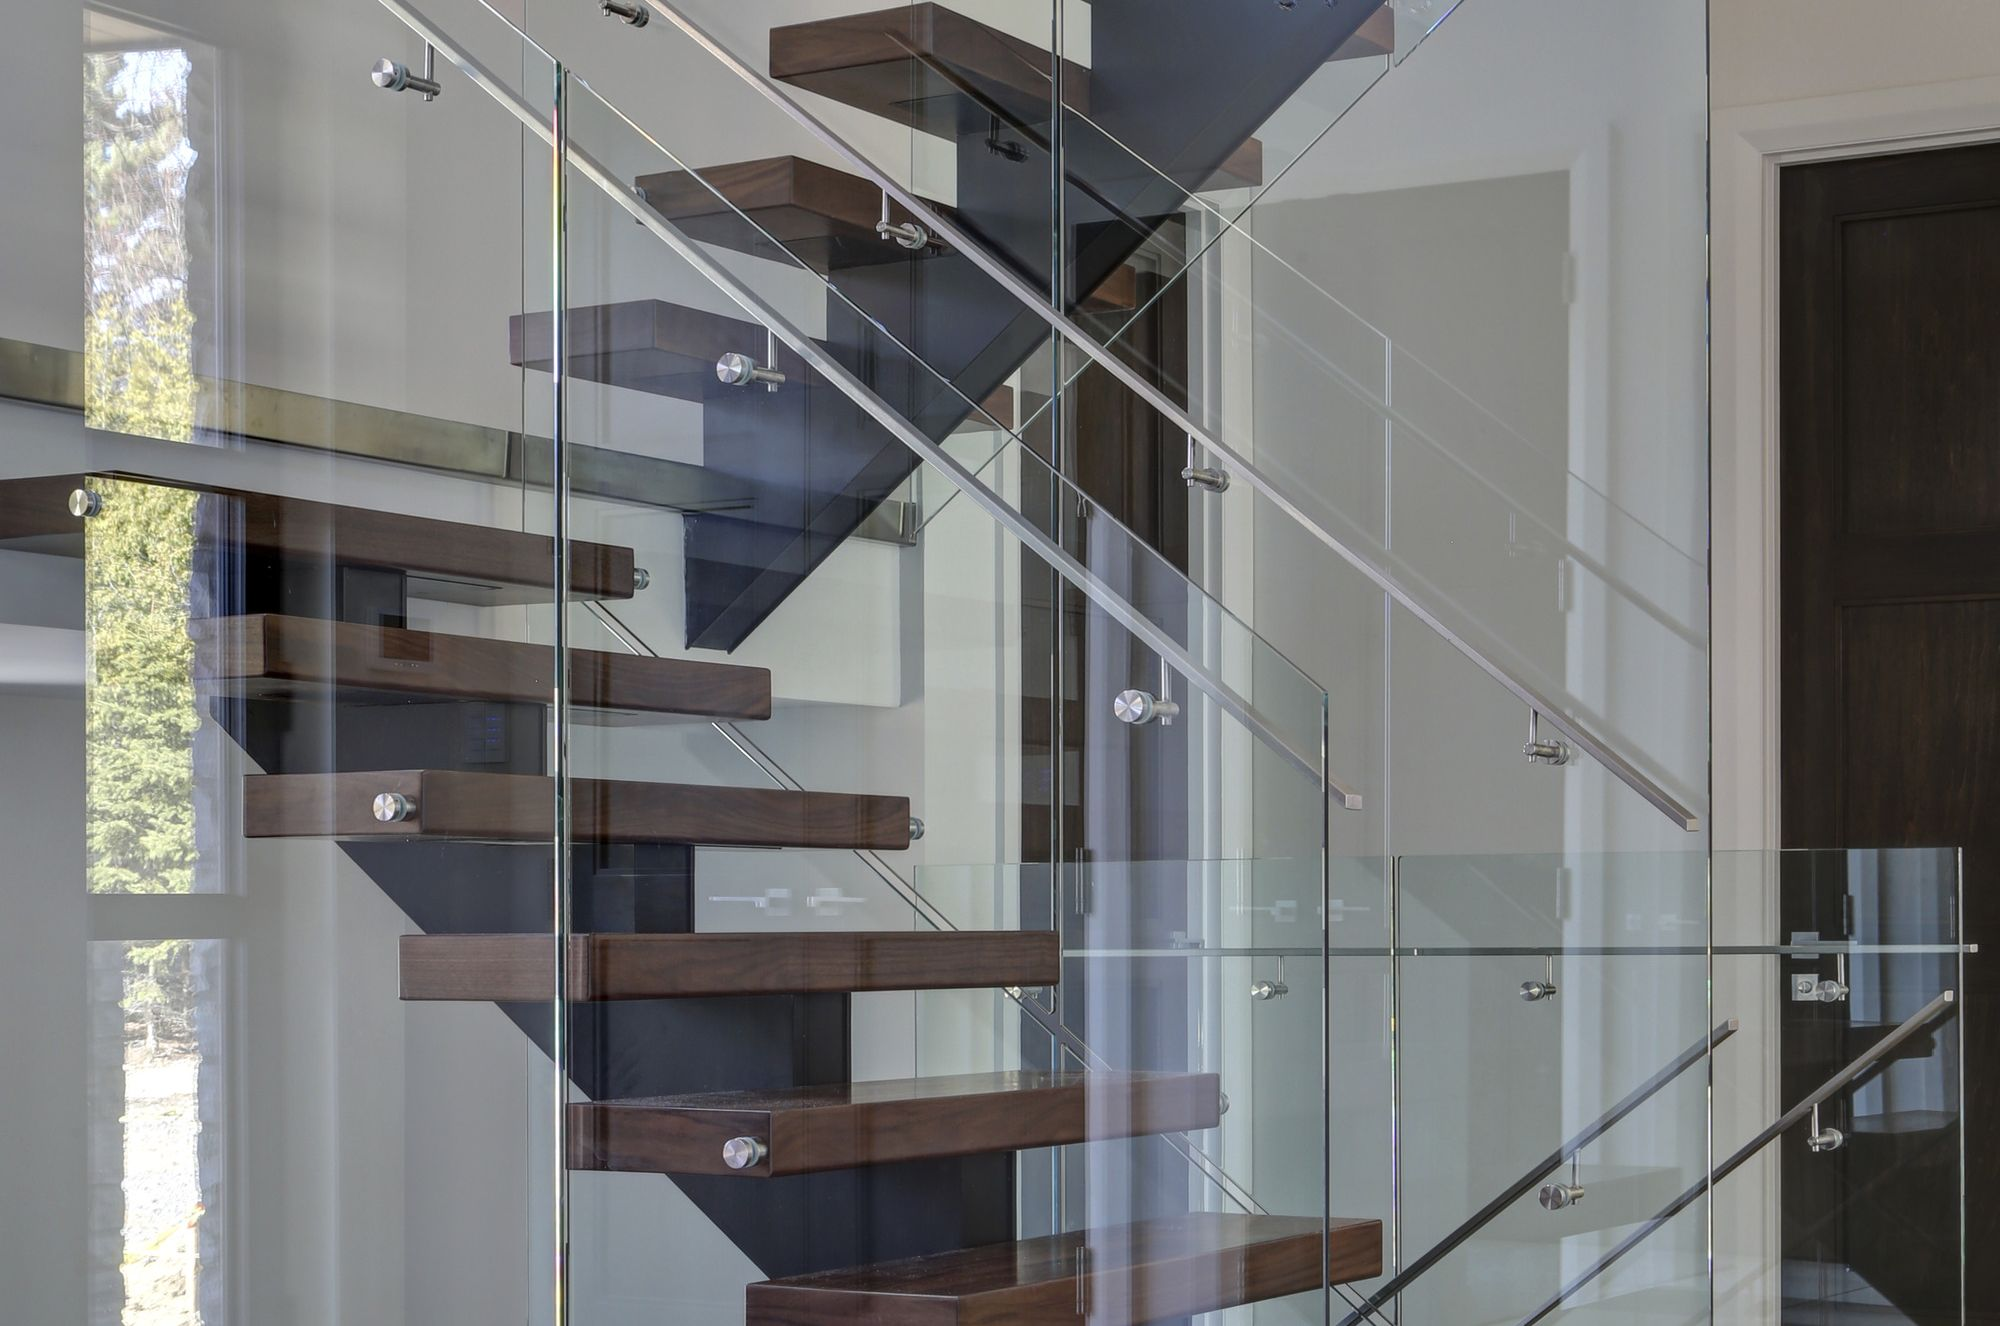 Backbone Staircase